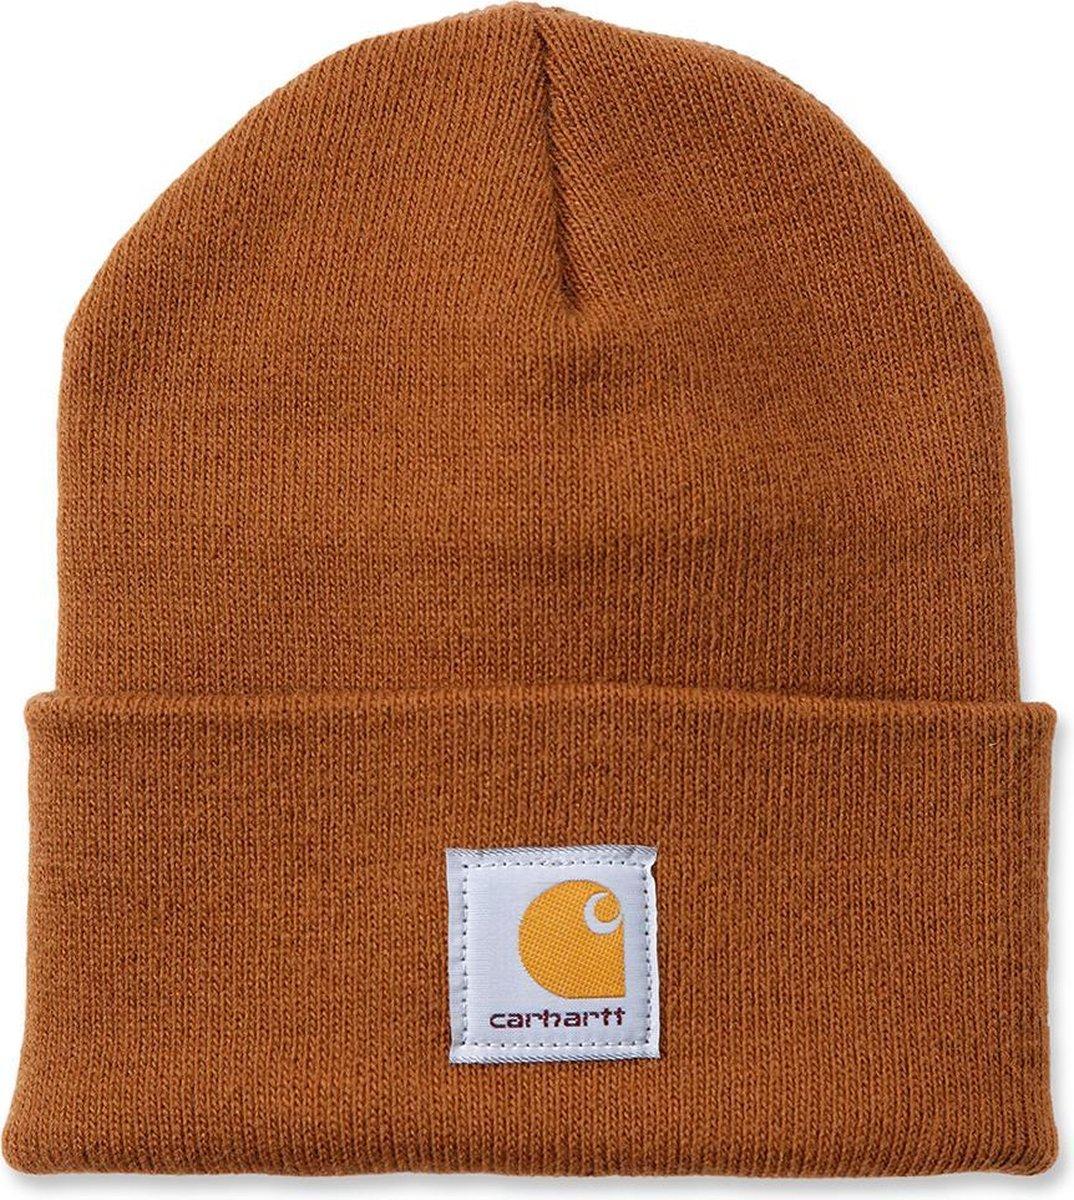 Carhartt Muts ACRYLIC WATCH HAT bruin - Beanie - Carhartt